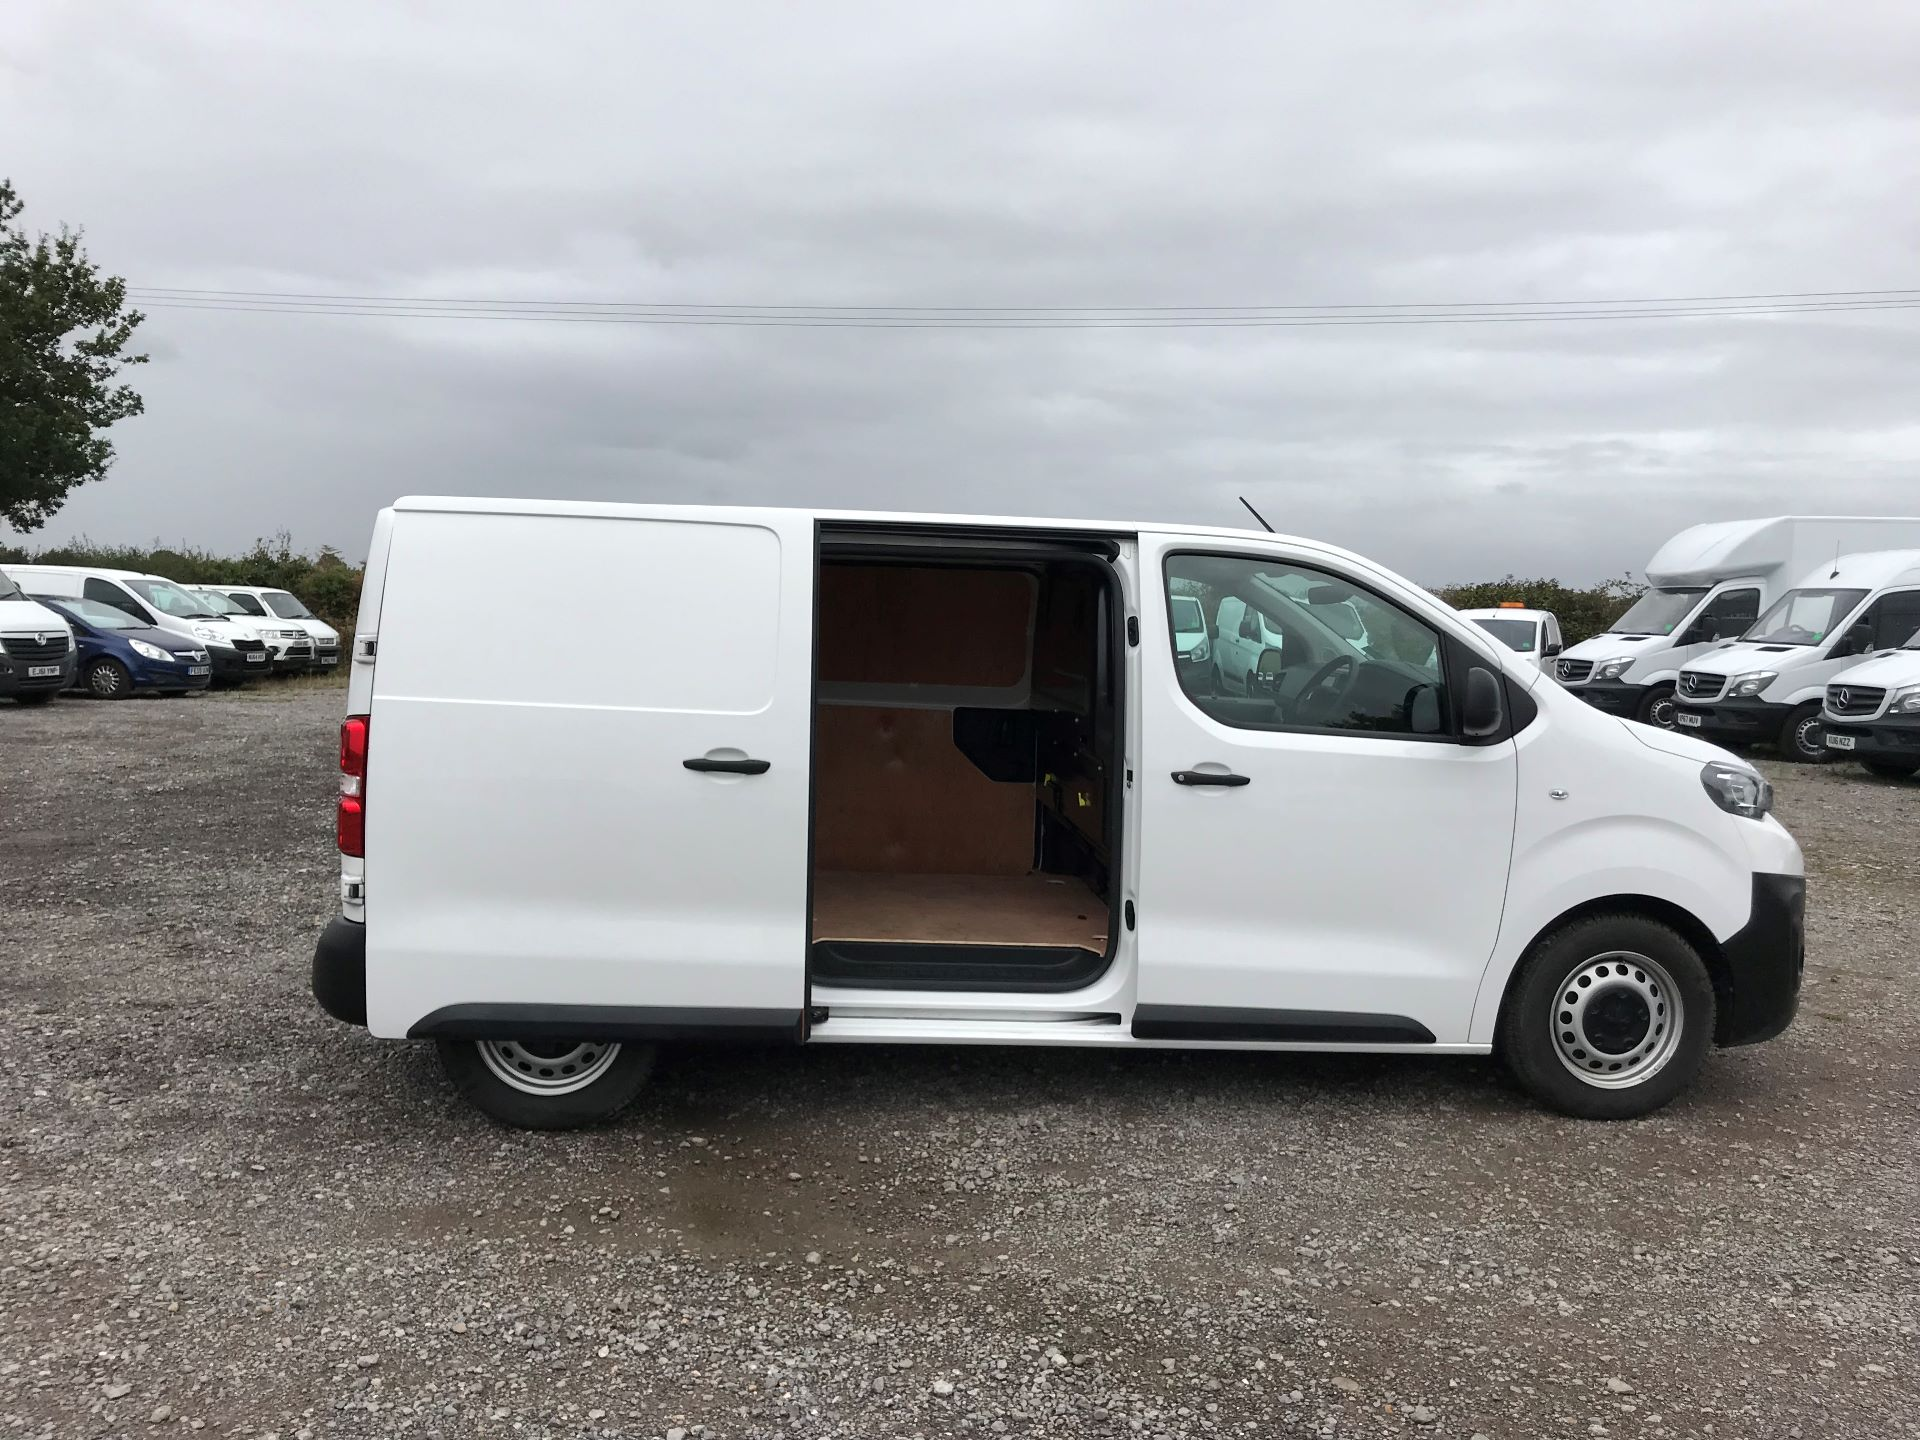 2018 Peugeot Expert STANDARD 1000 1.6 BLUEHDI 95 PROFESSIONAL EURO 6 (NU18PFO) Image 8